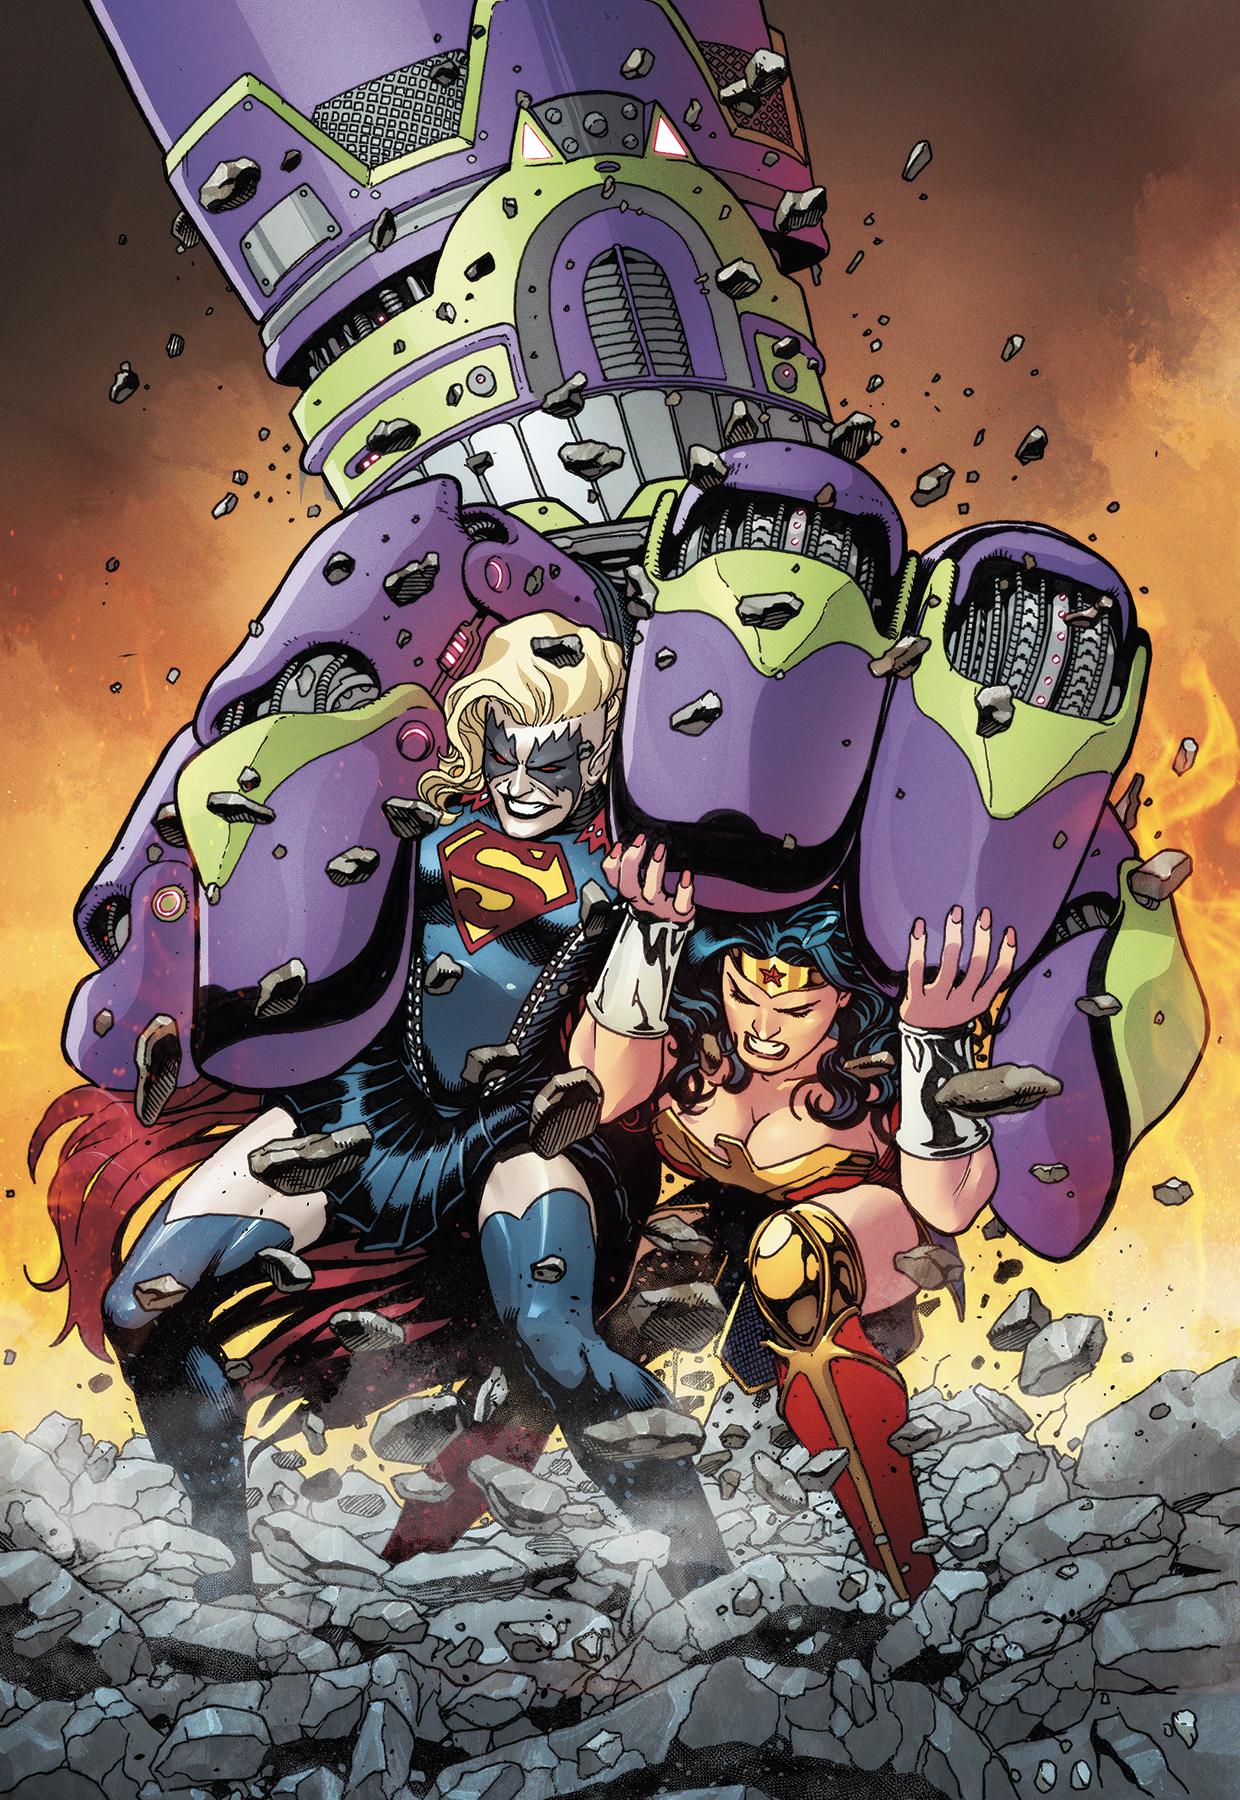 Supergirl Vol 7 39 Textless.jpg